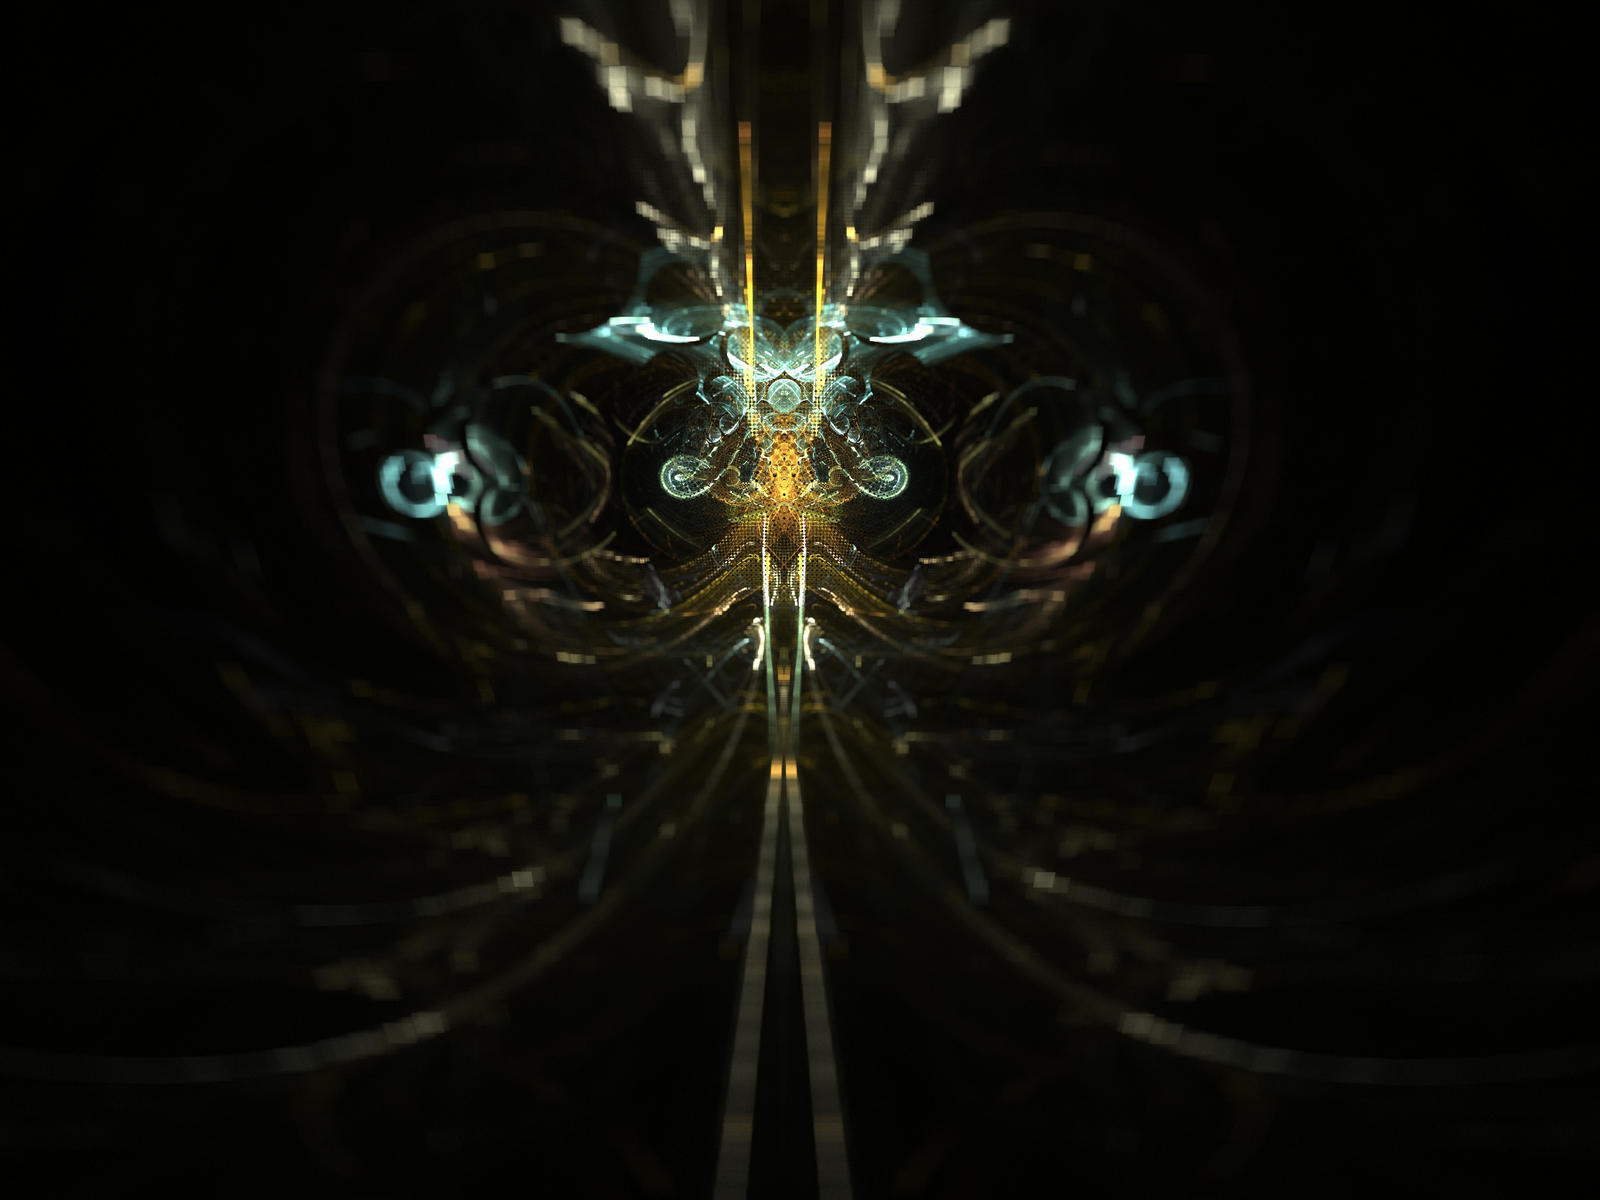 Teslacoaster by Karkan